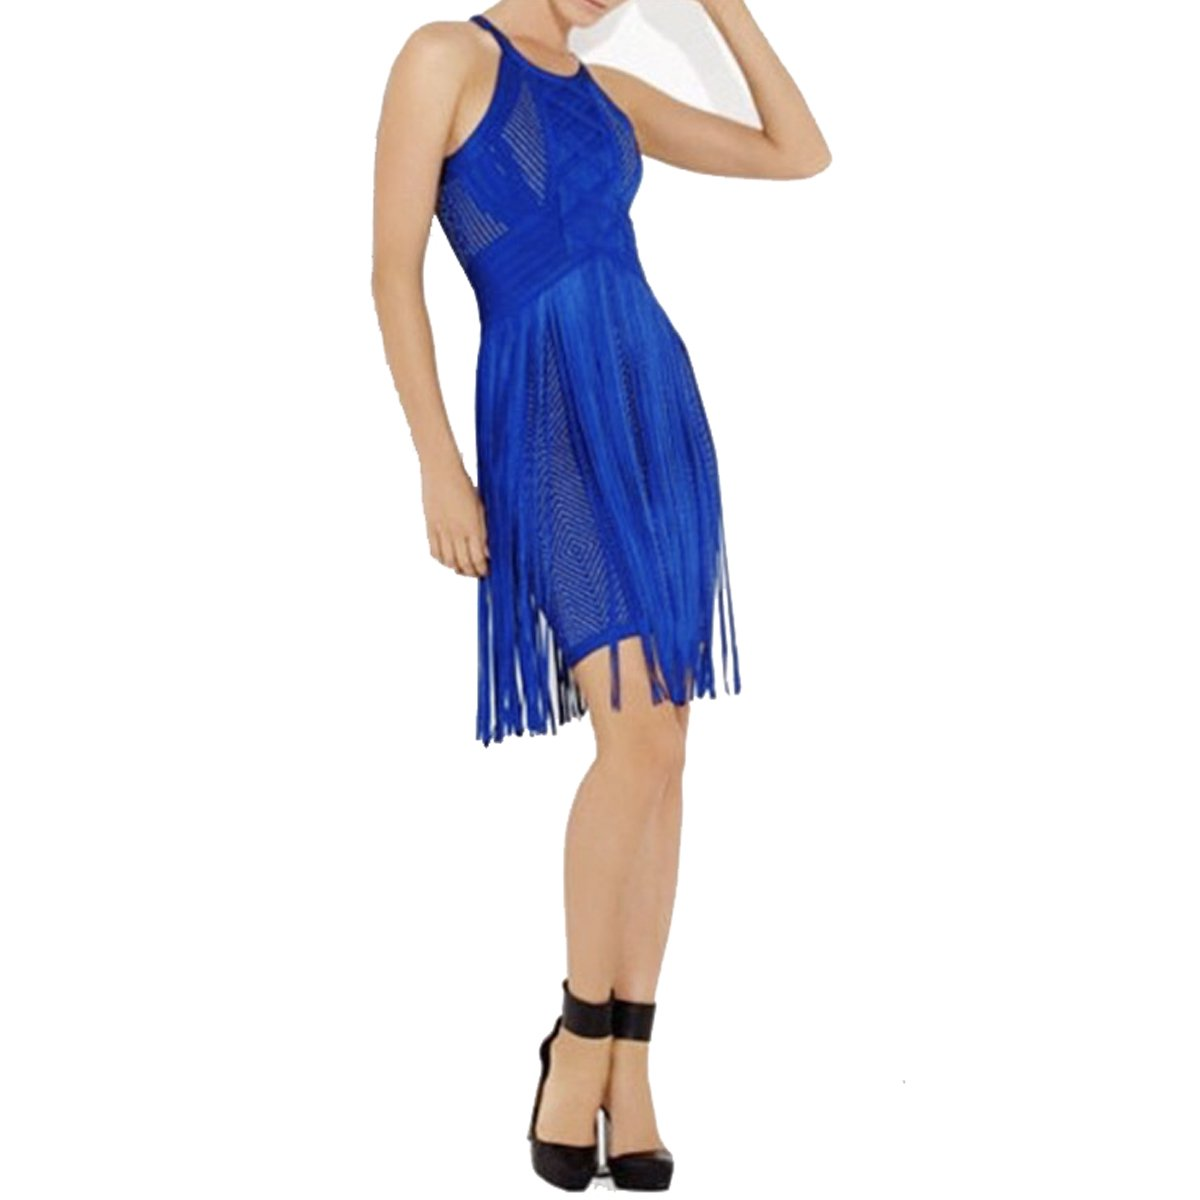 979c60c51 Hlbcbg New Women s Bandage Bodycon Dress Cocktail Lace Dress 2321 at Amazon  Women s Clothing store